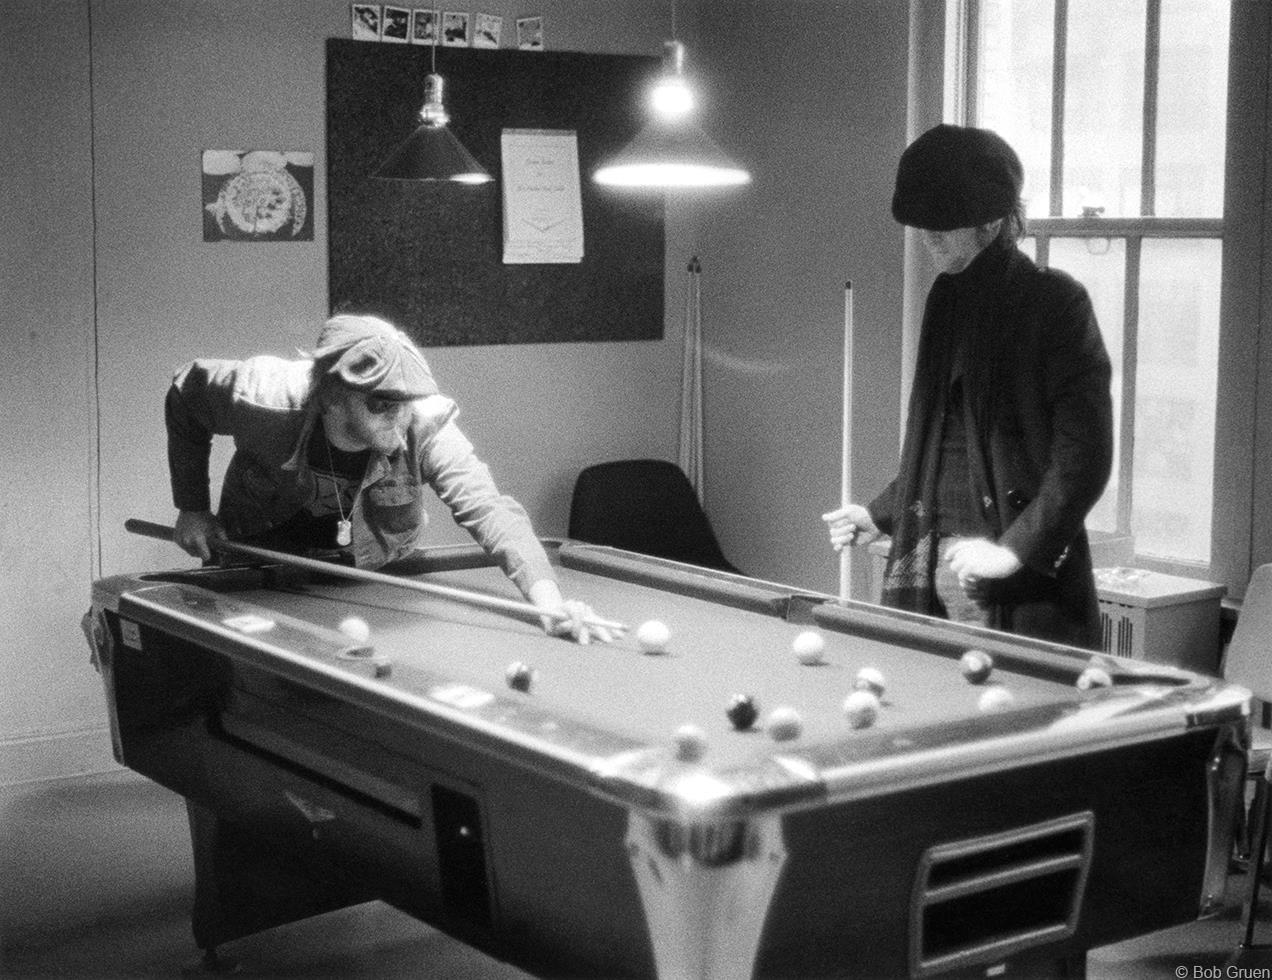 1974. Гарри Нилсон и Джон Леннон играют в бильярд